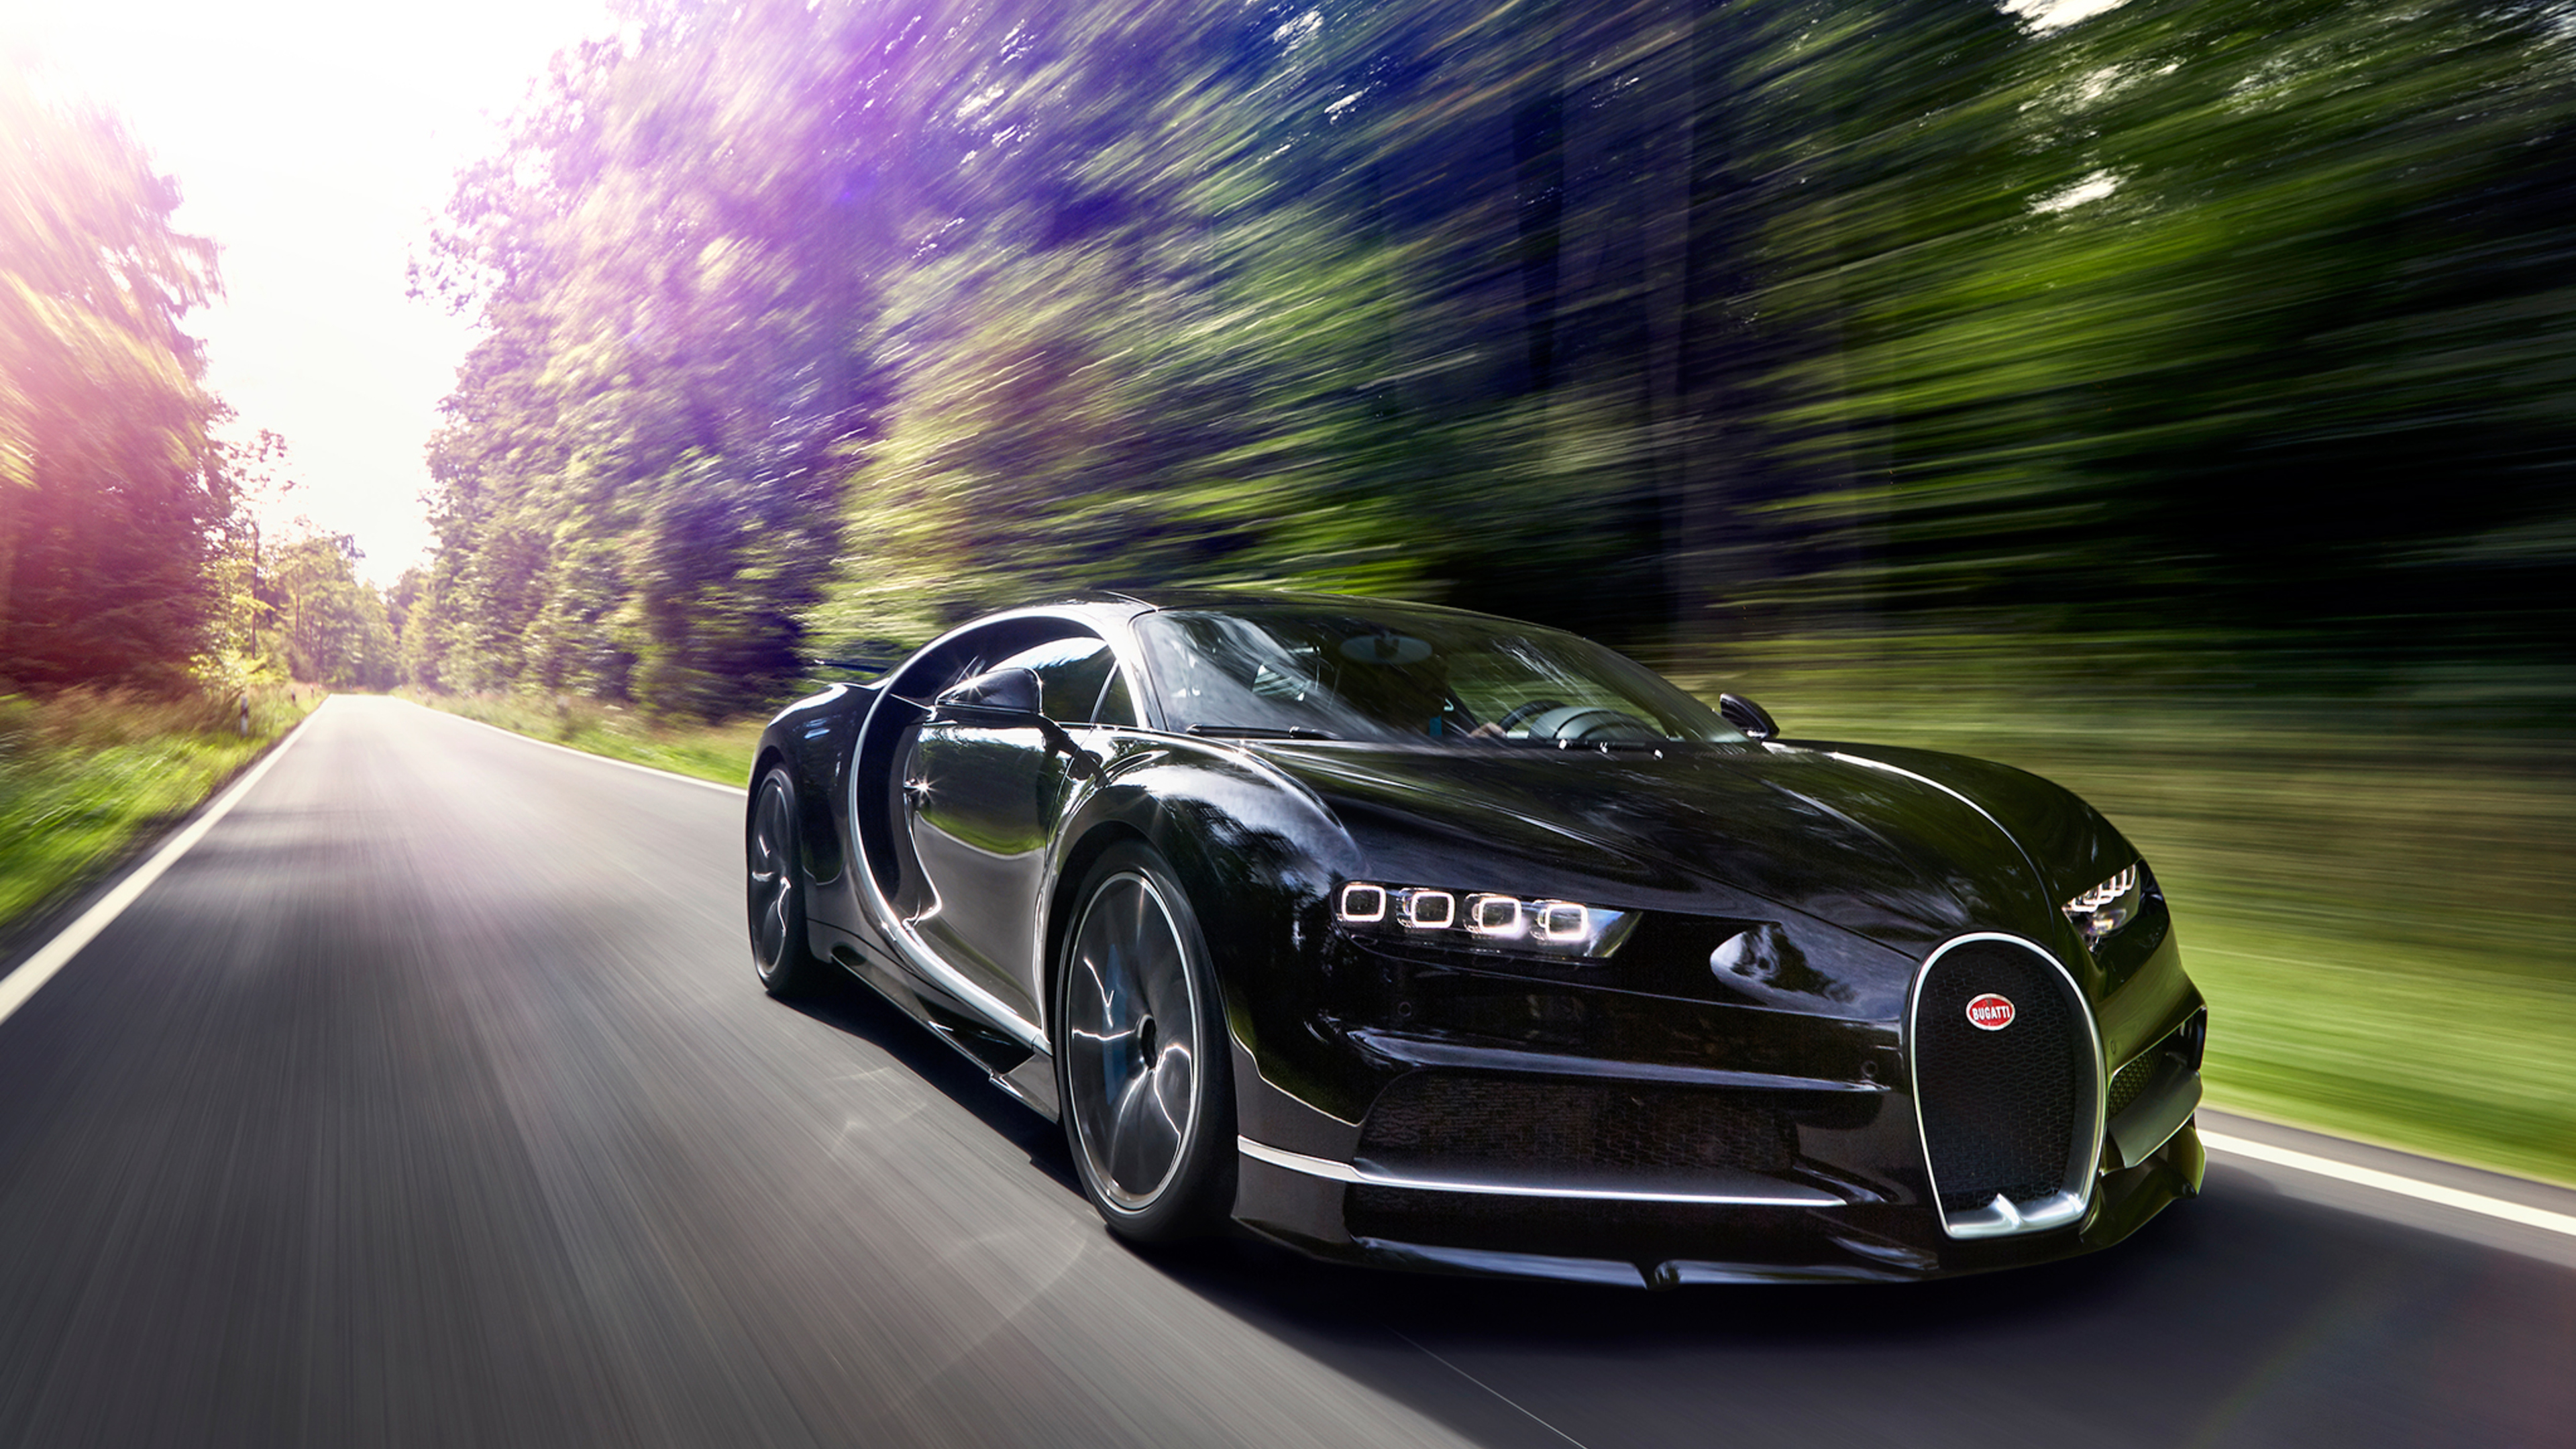 2017-bugatti-chiron-in-motion-ap.jpg